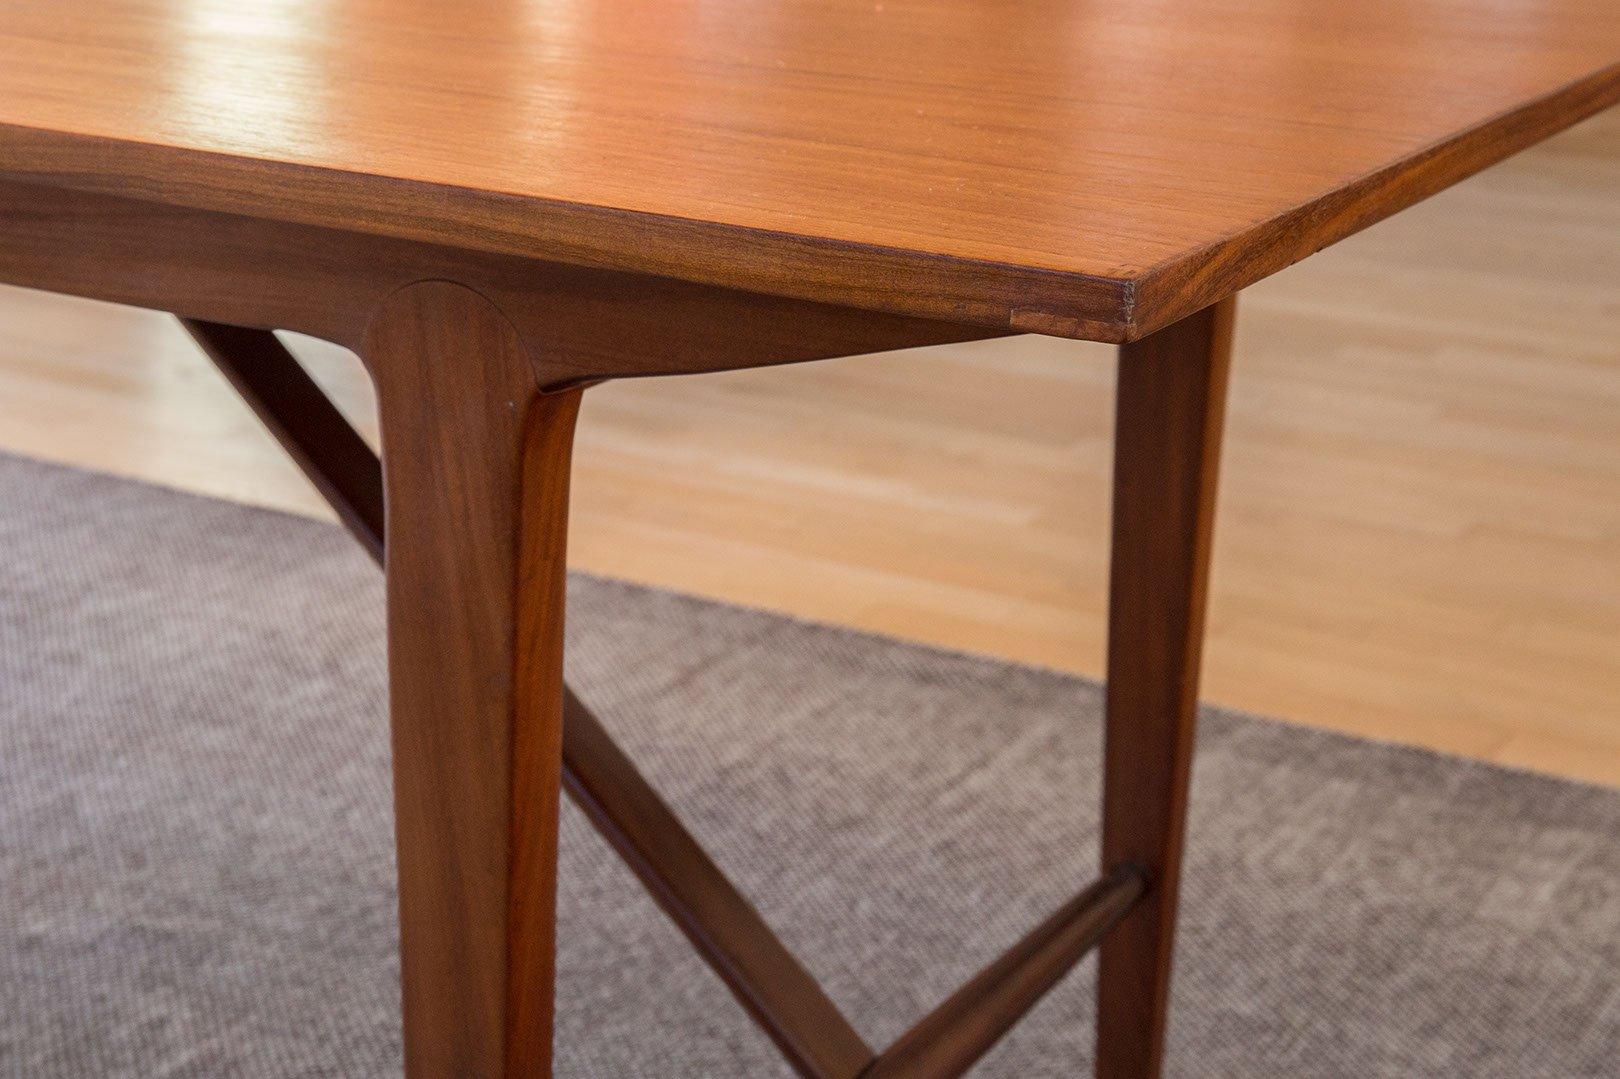 table de salle manger extensible vintage danemark en vente sur pamono. Black Bedroom Furniture Sets. Home Design Ideas